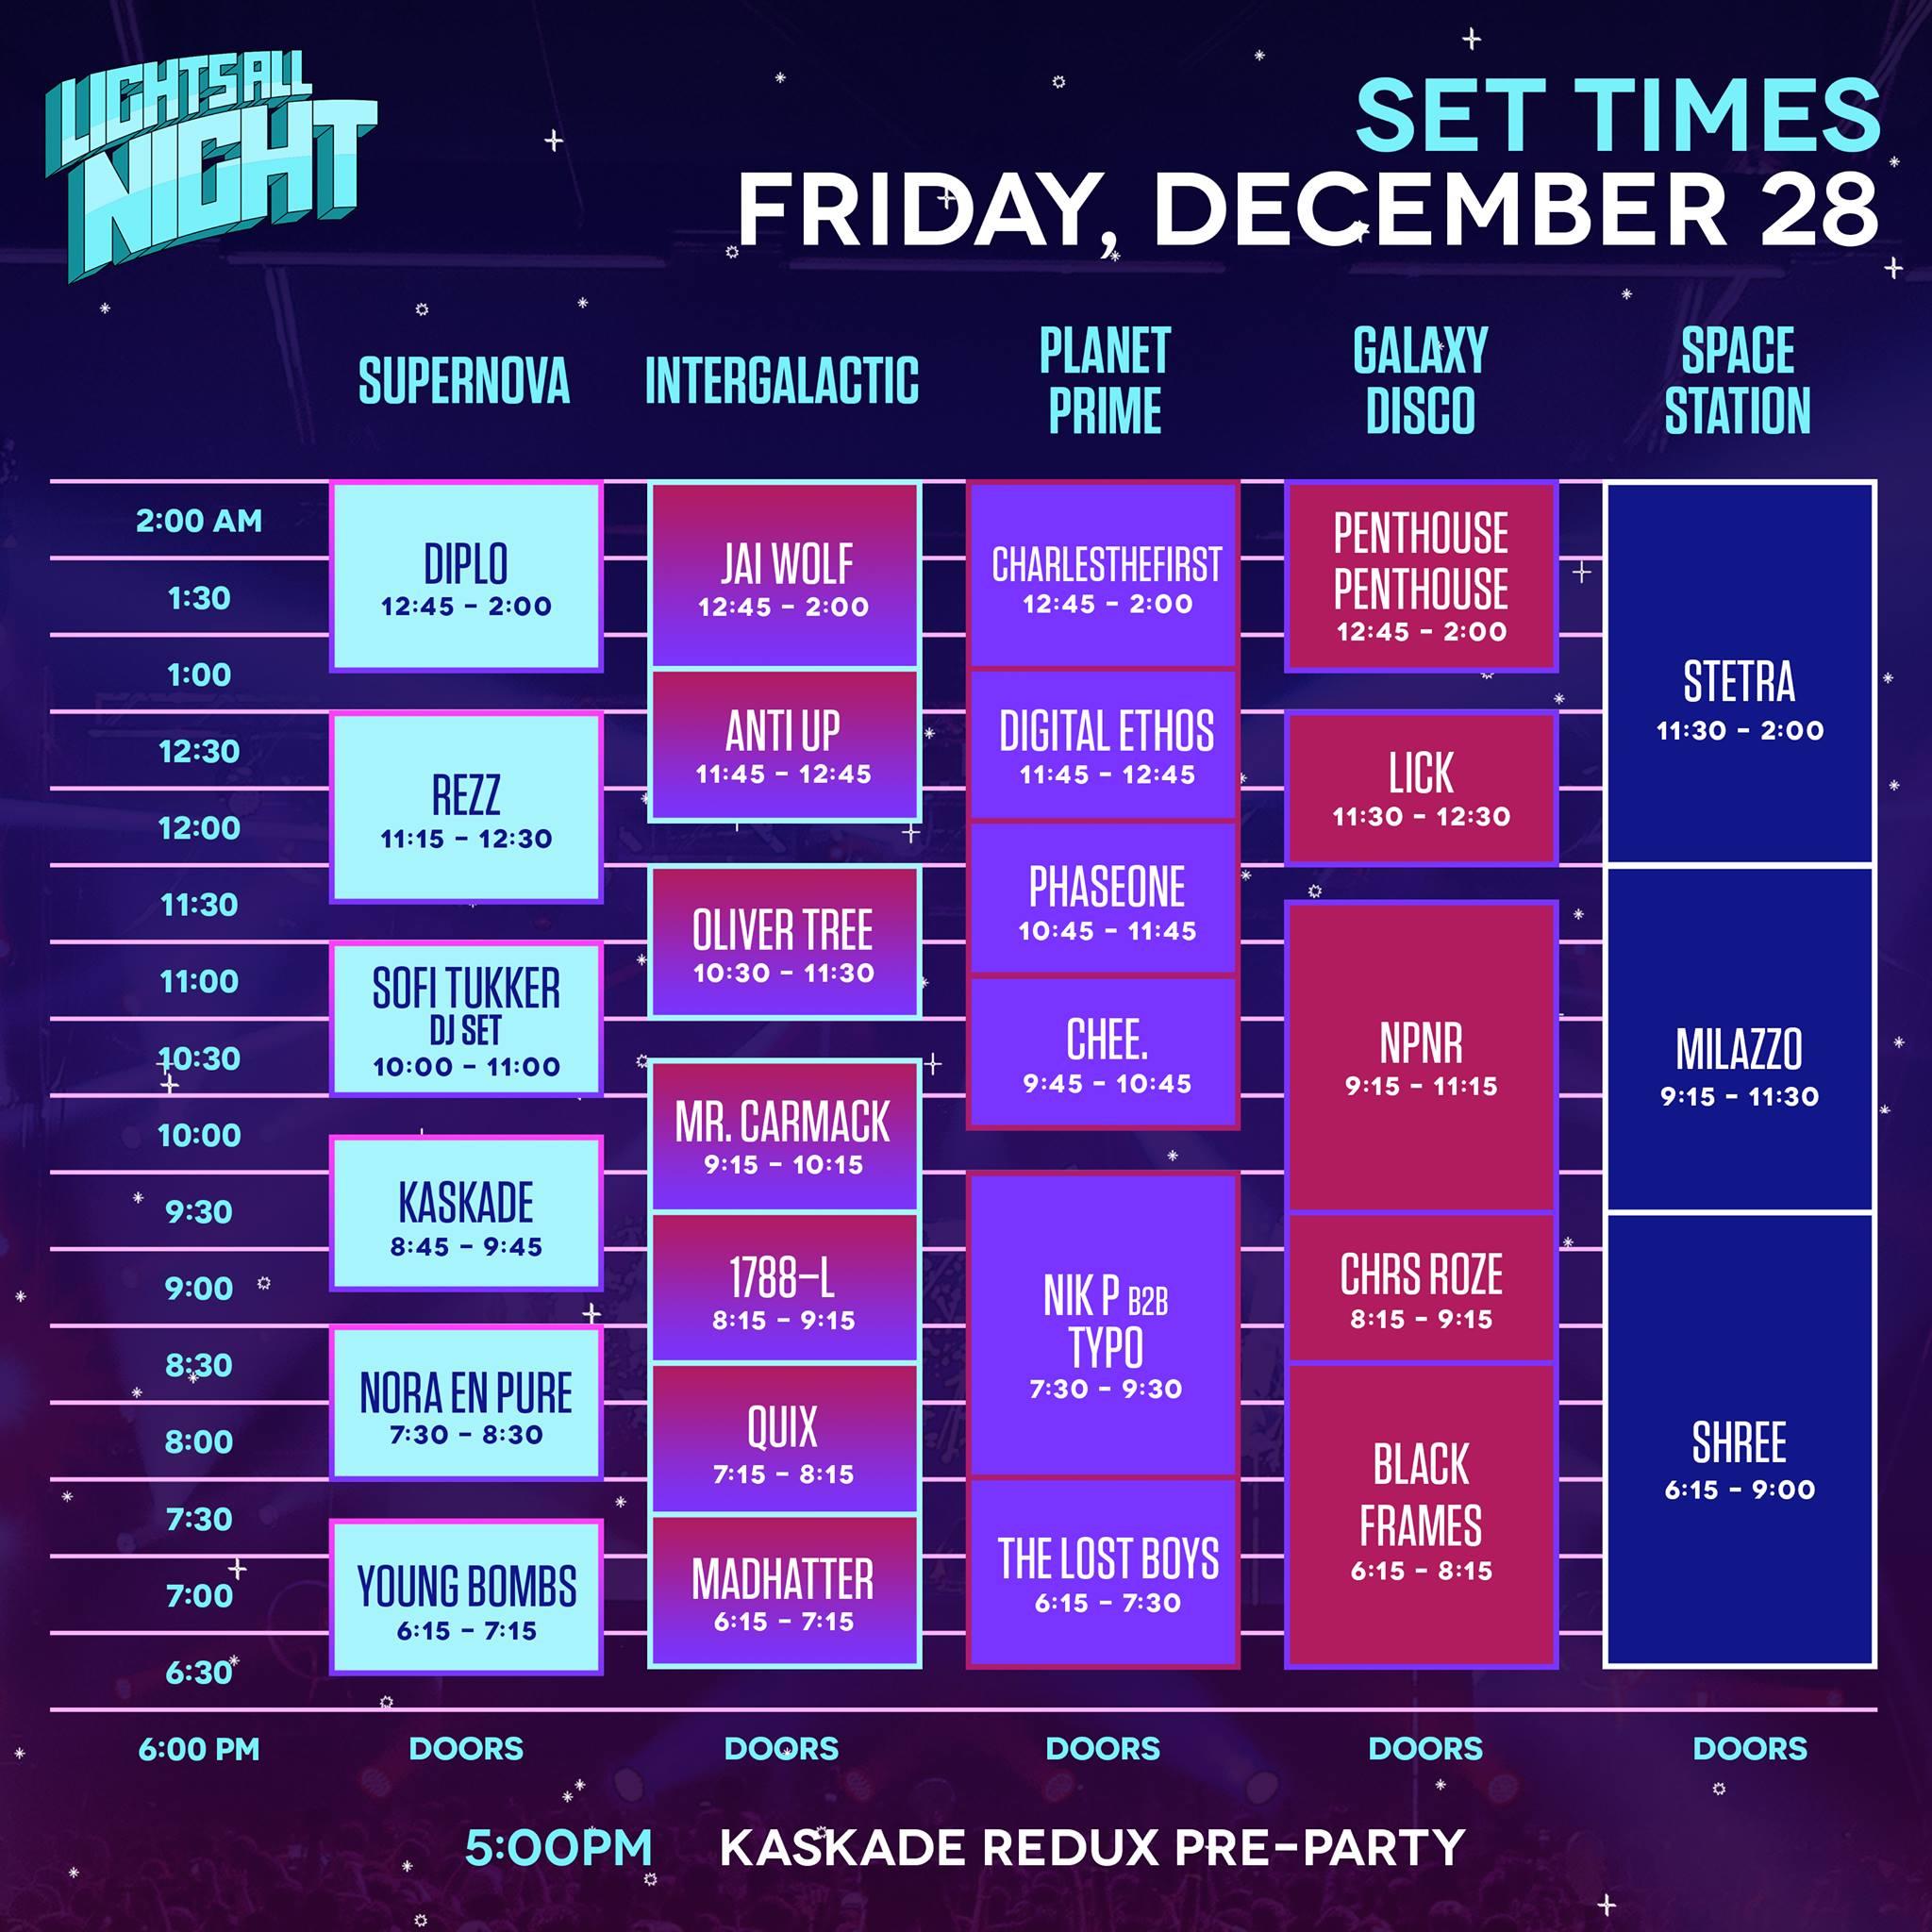 Lights All Night 2018 - Set Times - Dec. 28.jpg